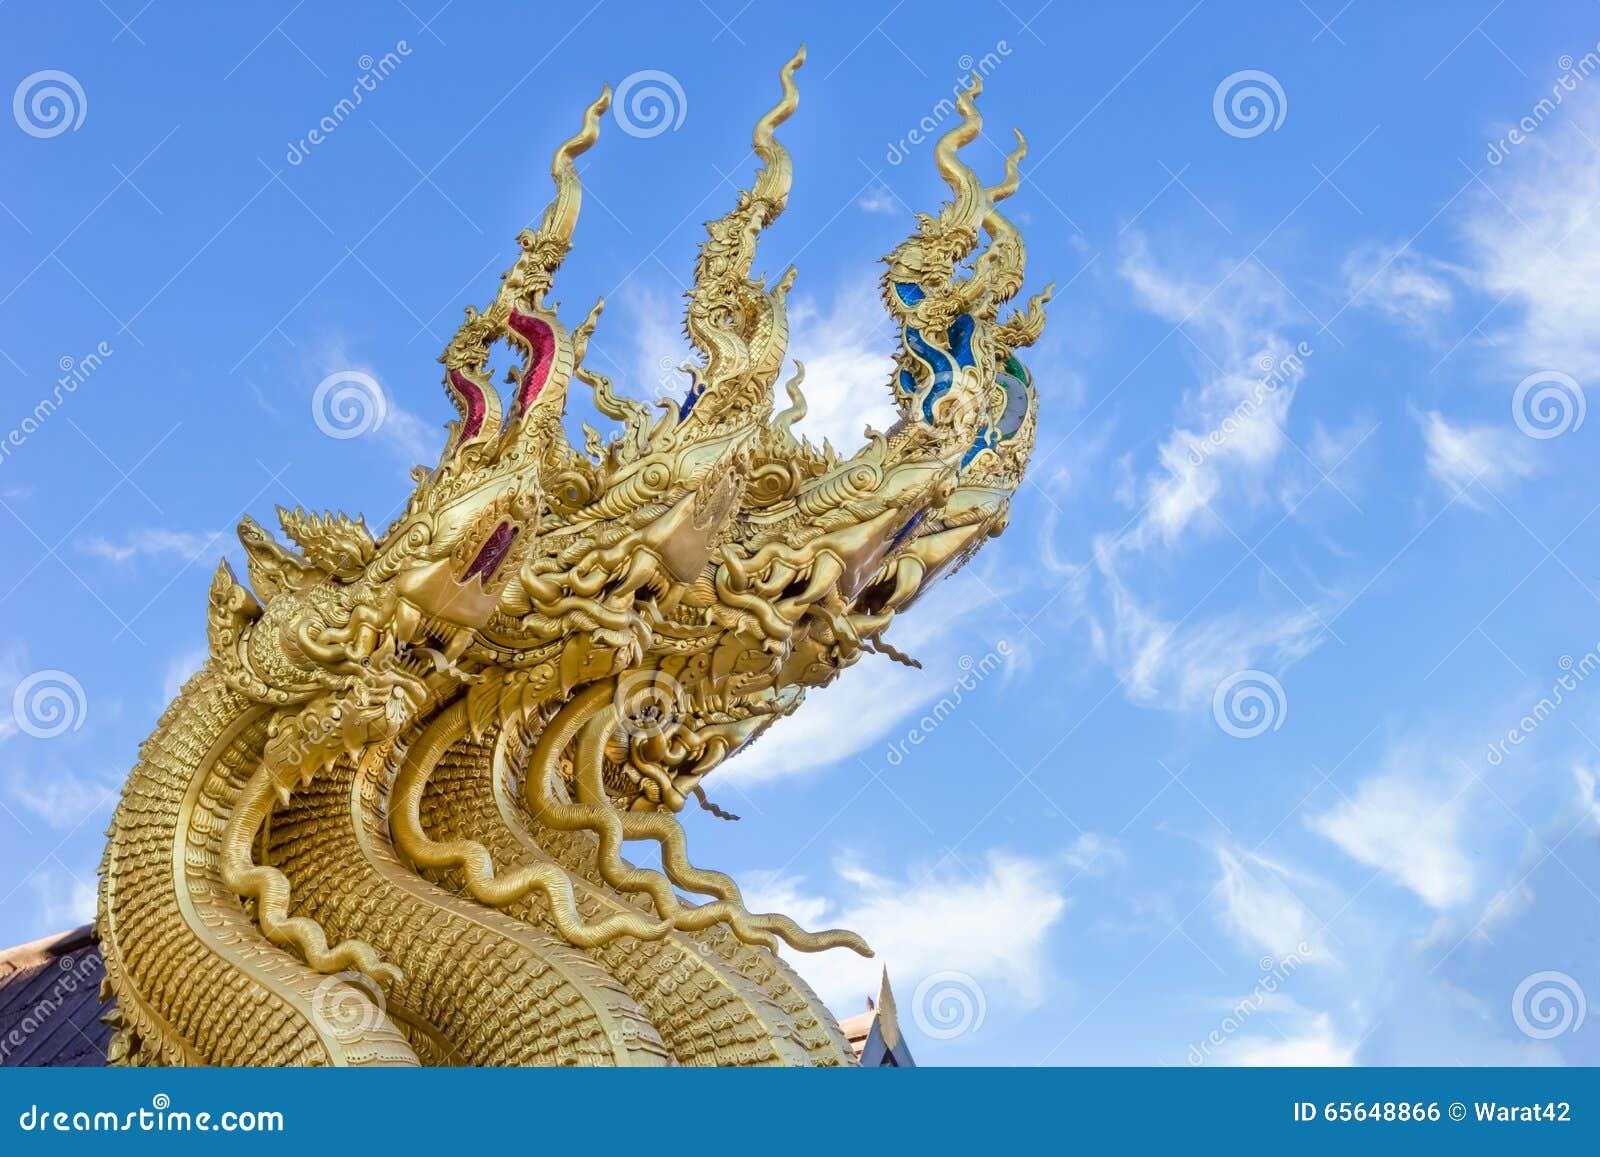 Sculpture en dragon au temple de Sri Pan Ton, province Nan, Thaïlande